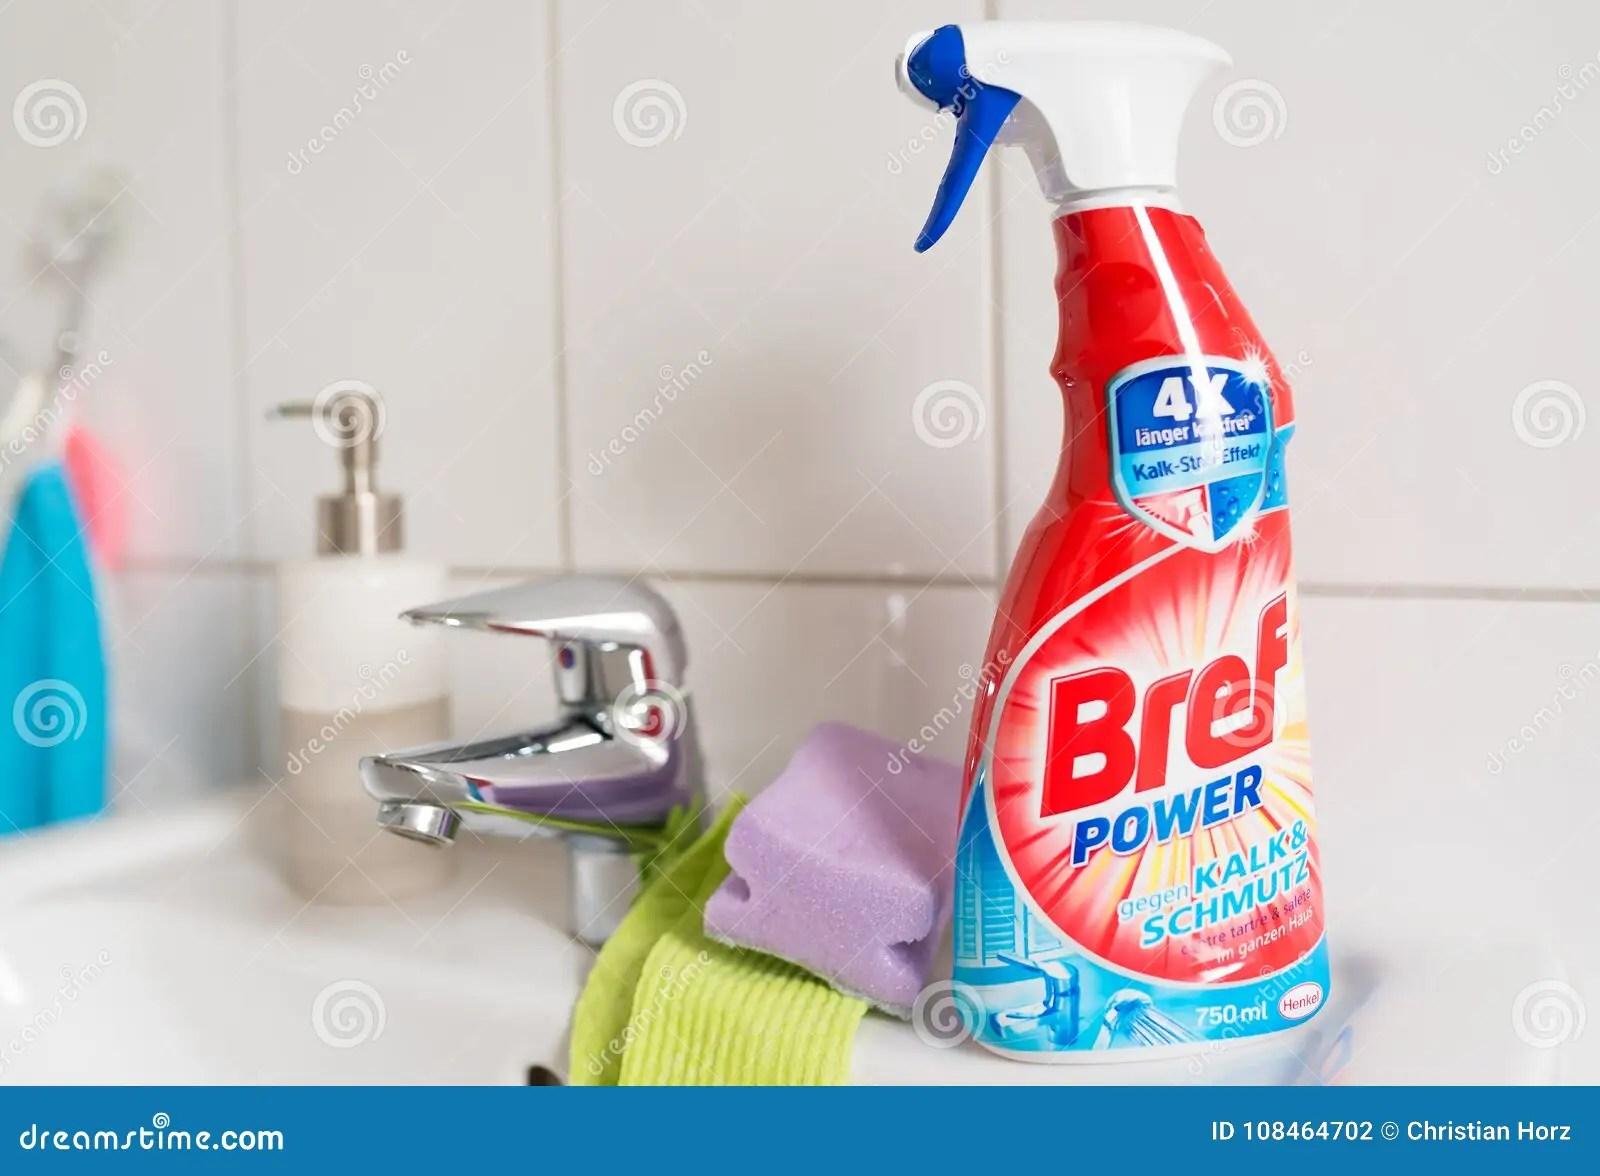 https www dreamstime com hamburg germany illustrative editorial bref power bathroom cleaner spray bathroom sink bref power bathroom cleaner spray image108464702